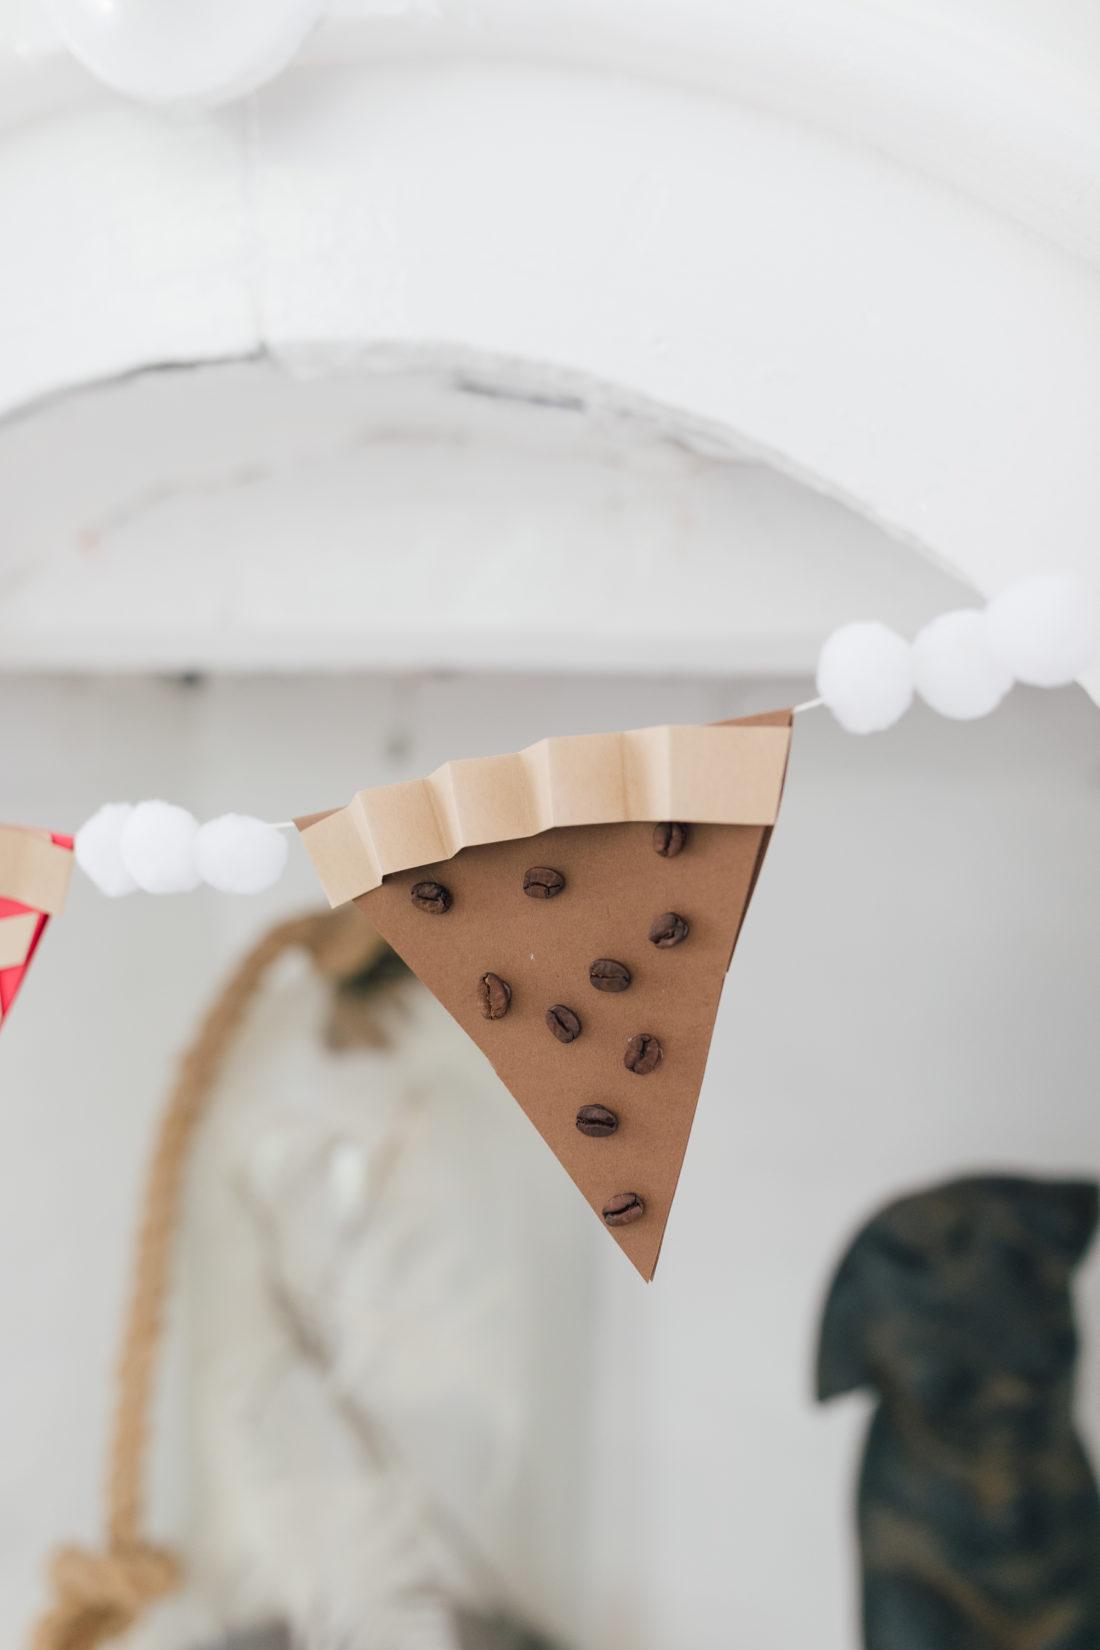 Eva Amurri Martino shares an easy autumnal decor DIY pie garland